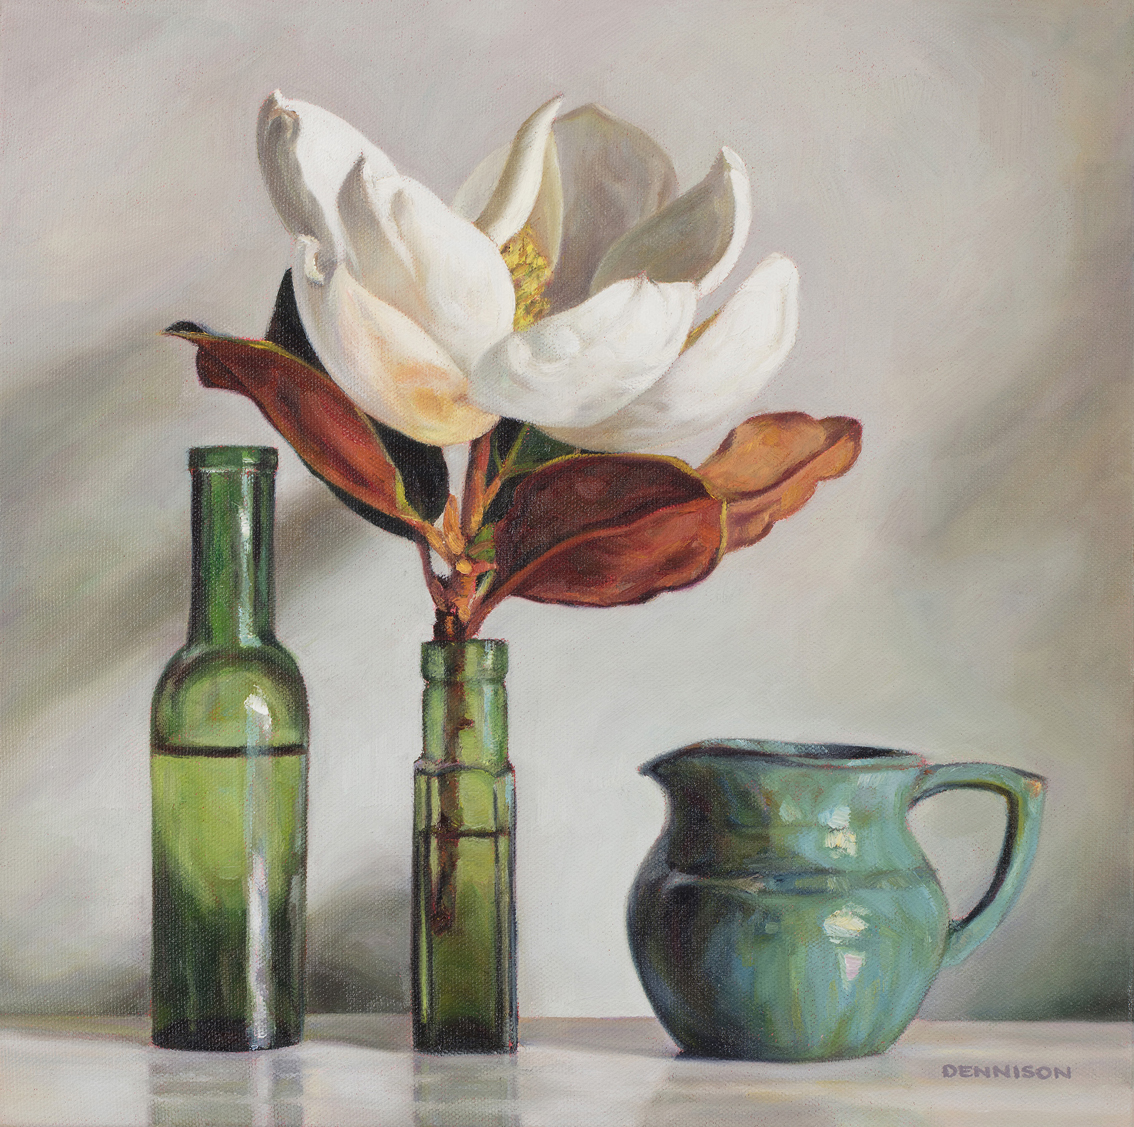 Green Still Life with Magnolia   Oil on Canvas, 36cm x 36cm